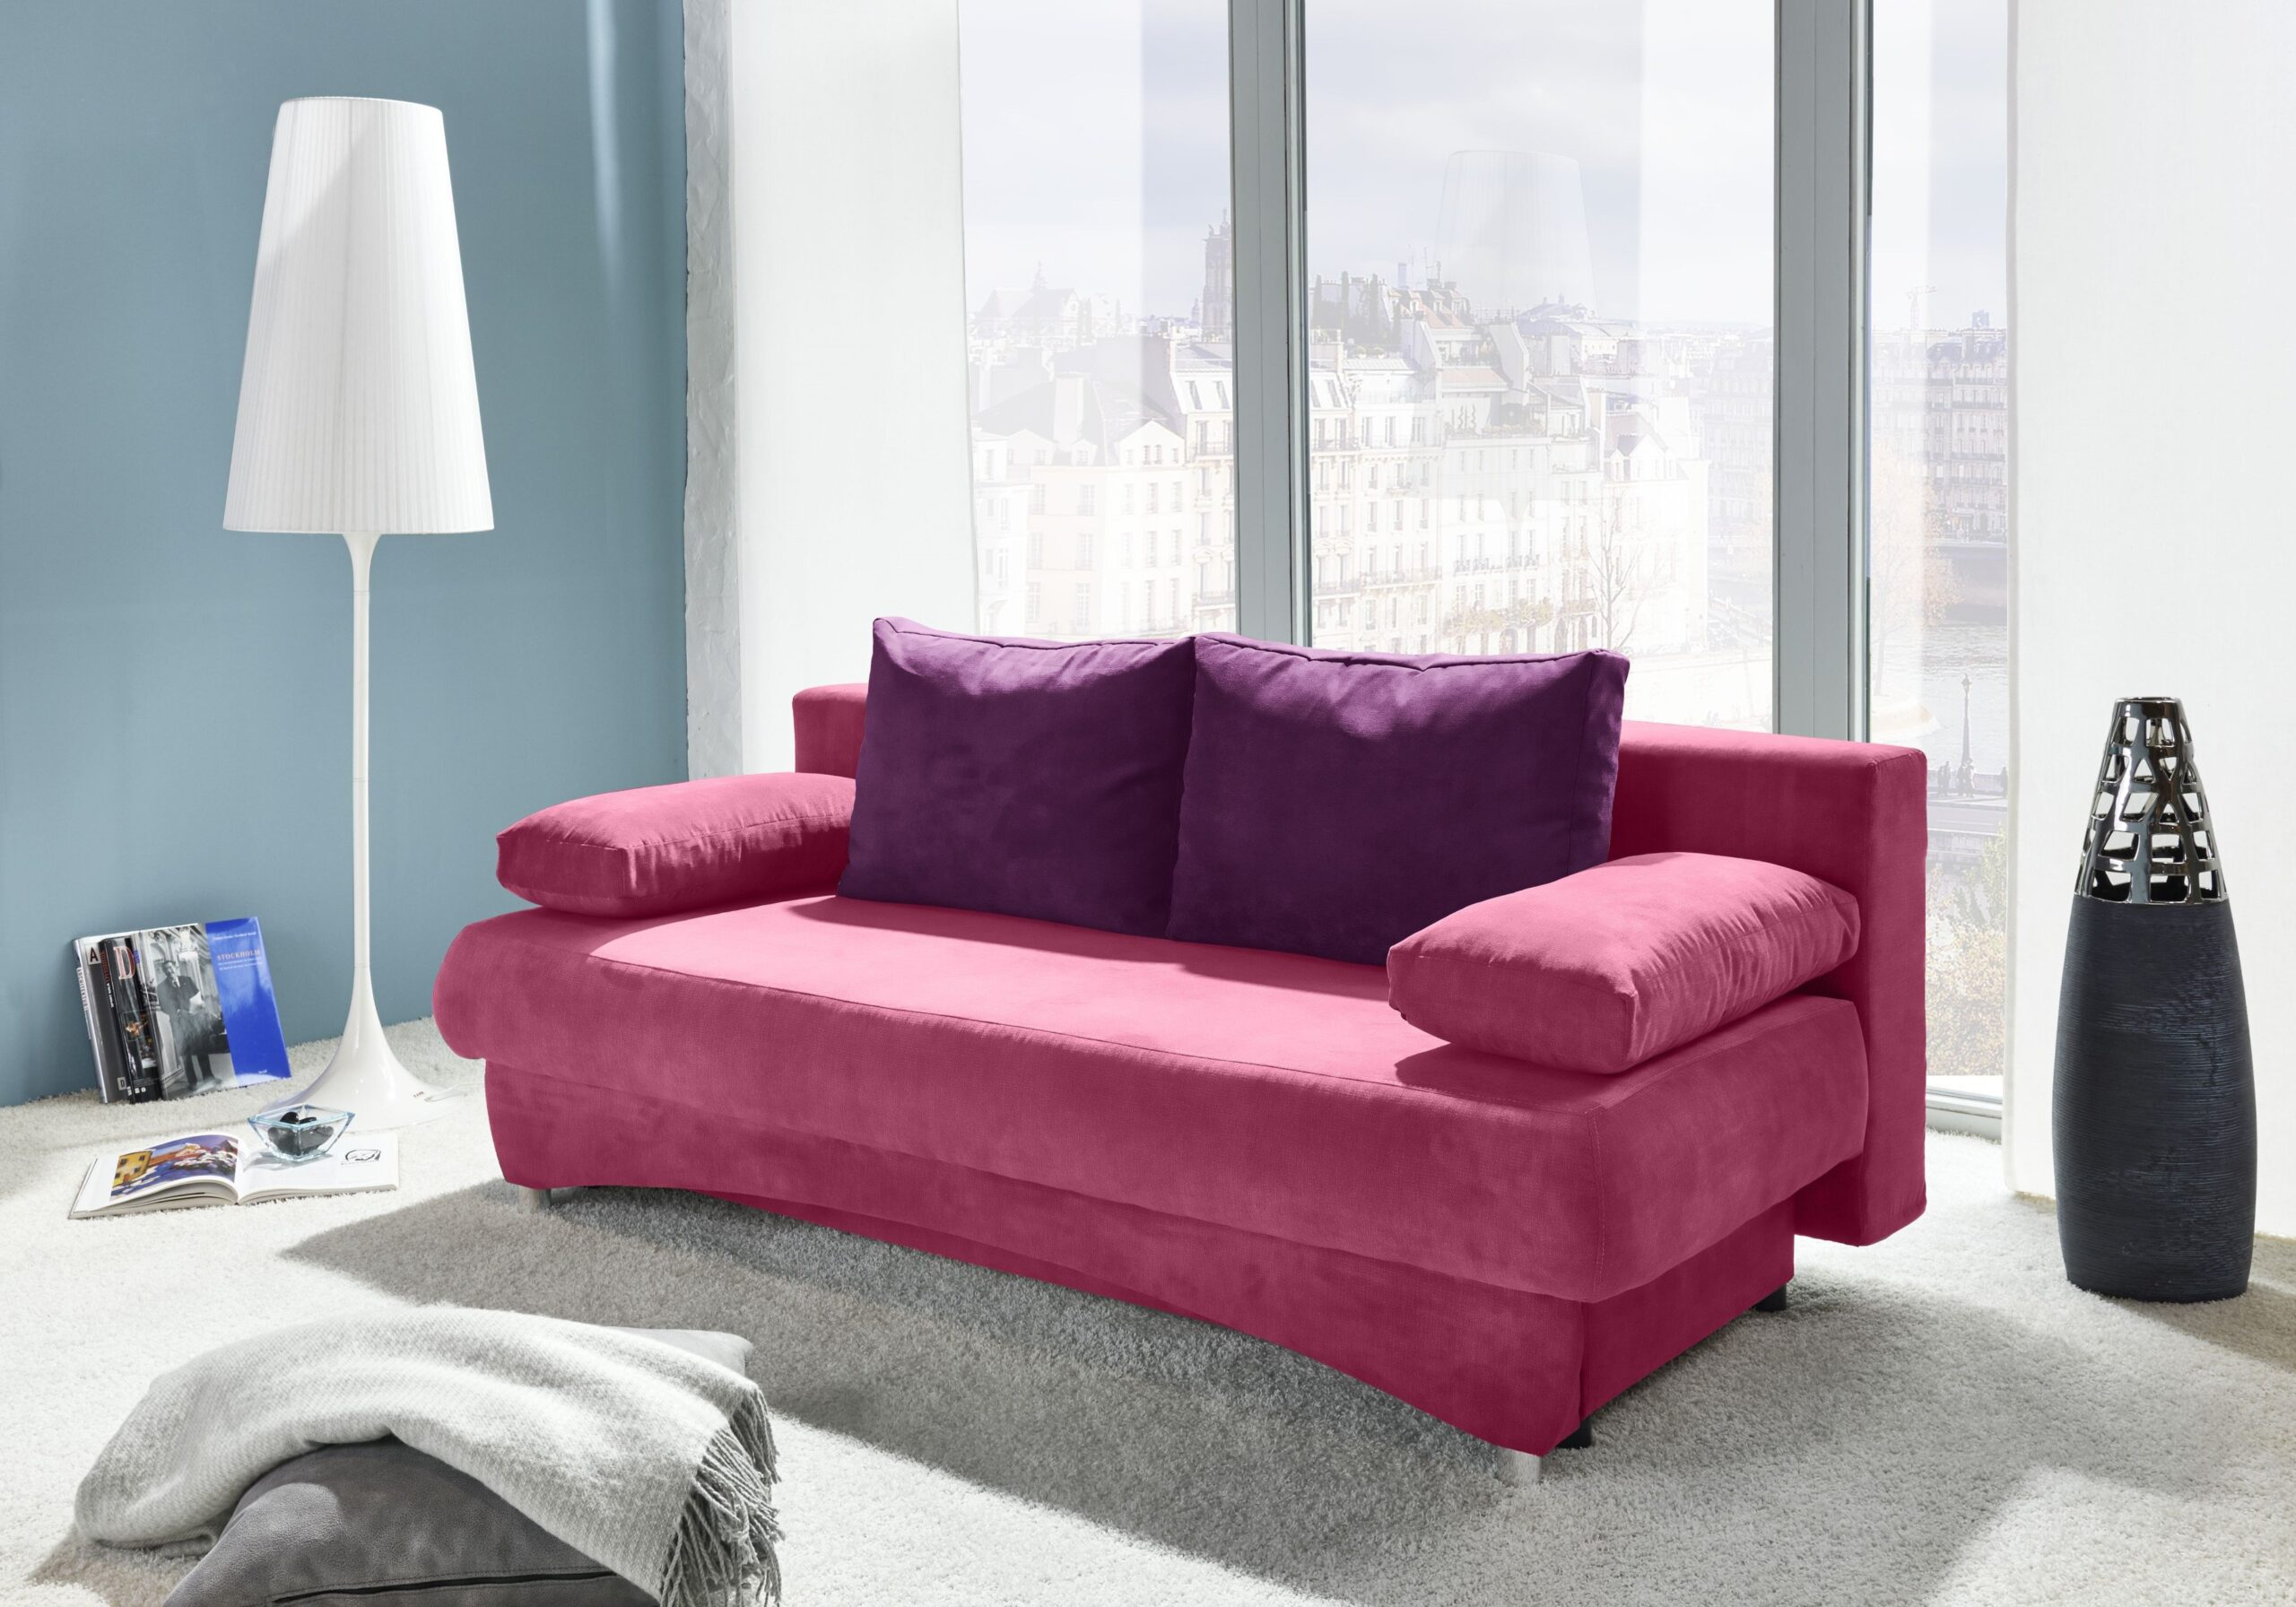 Full Size of Sofa Lila Ikea Lilah Raymour And Flanigan Salon Lilac Cushions Sleeper Corner Throws Queen Bed Landhausstil Bezug Ecksofa Mit Ottomane Kissen Günstiges 2 Sofa Sofa Lila